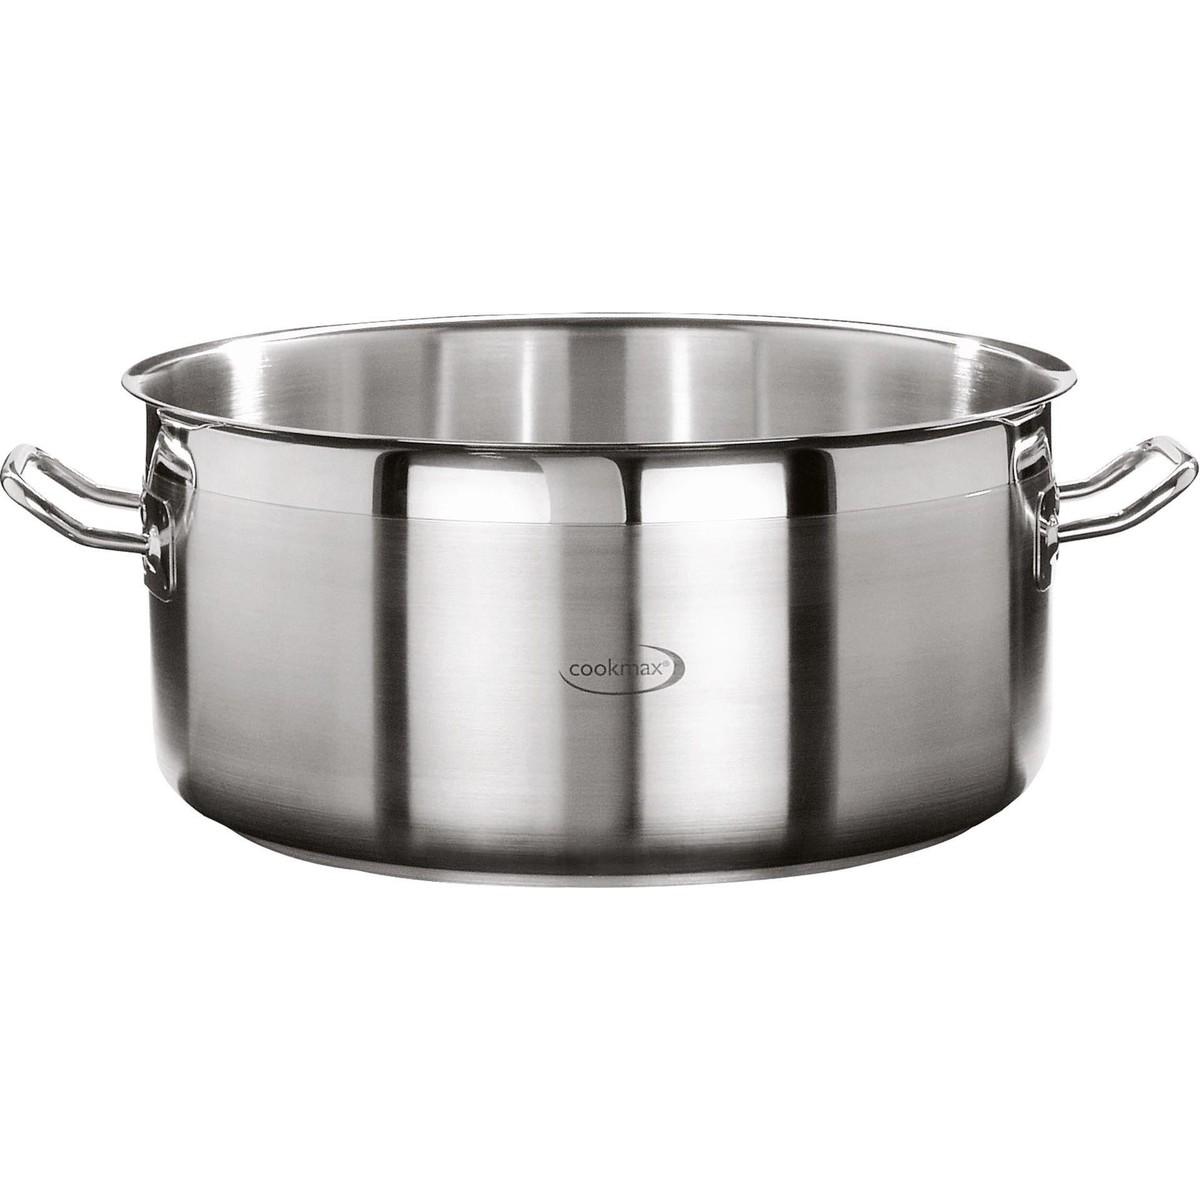 "Bratentopf flach ""Cookmax Professional"" Ø 28 cm, H: 12 cm. Inhalt 7,4L"